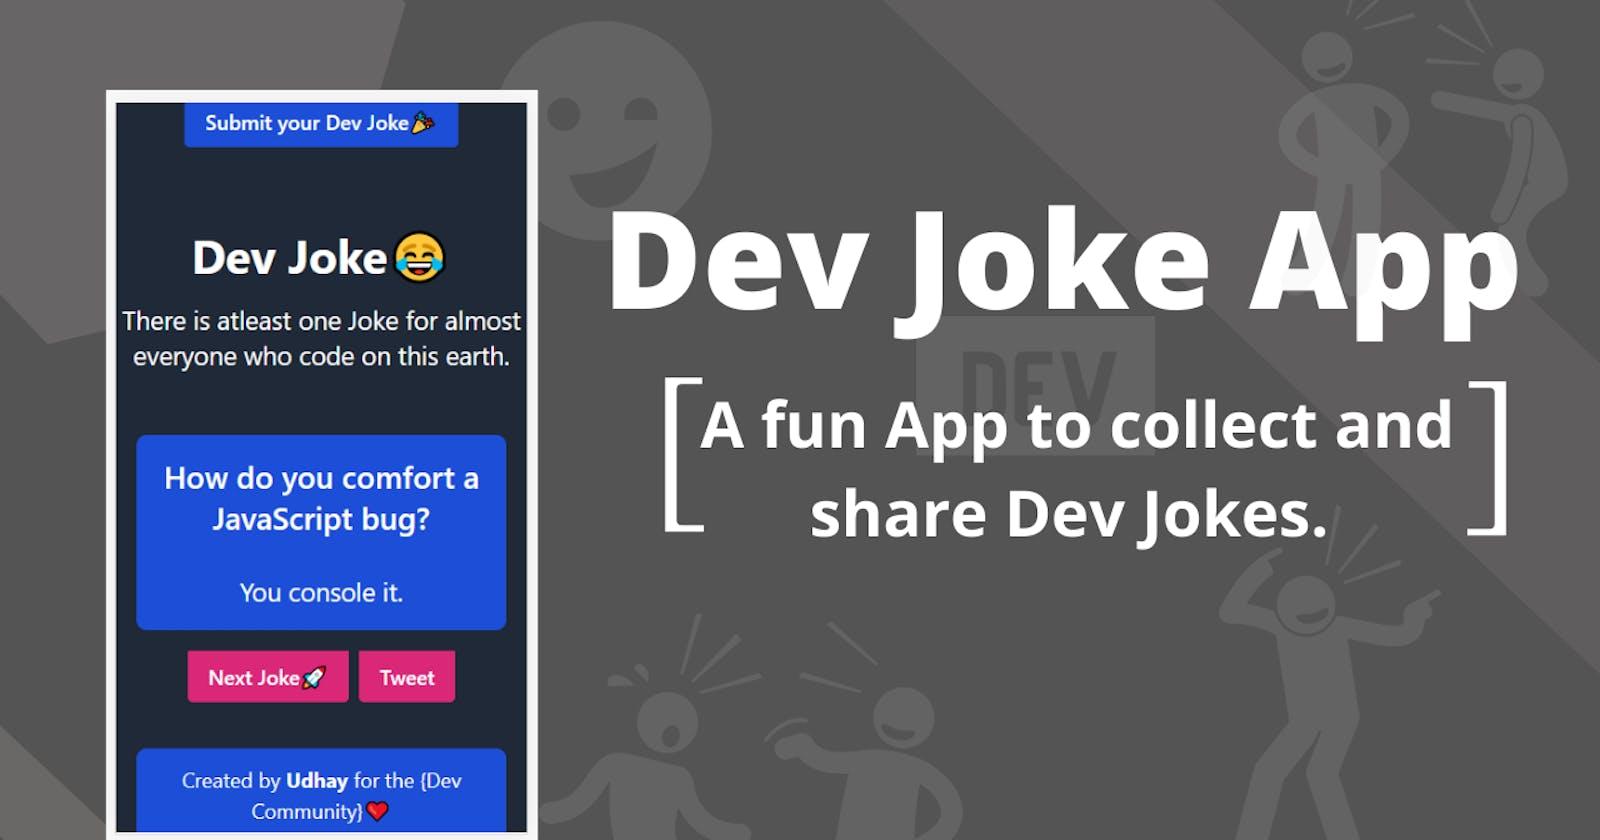 """Dev Joke"" App 😂 - A fun app to collect and share Dev Jokes.👨🏽💻"